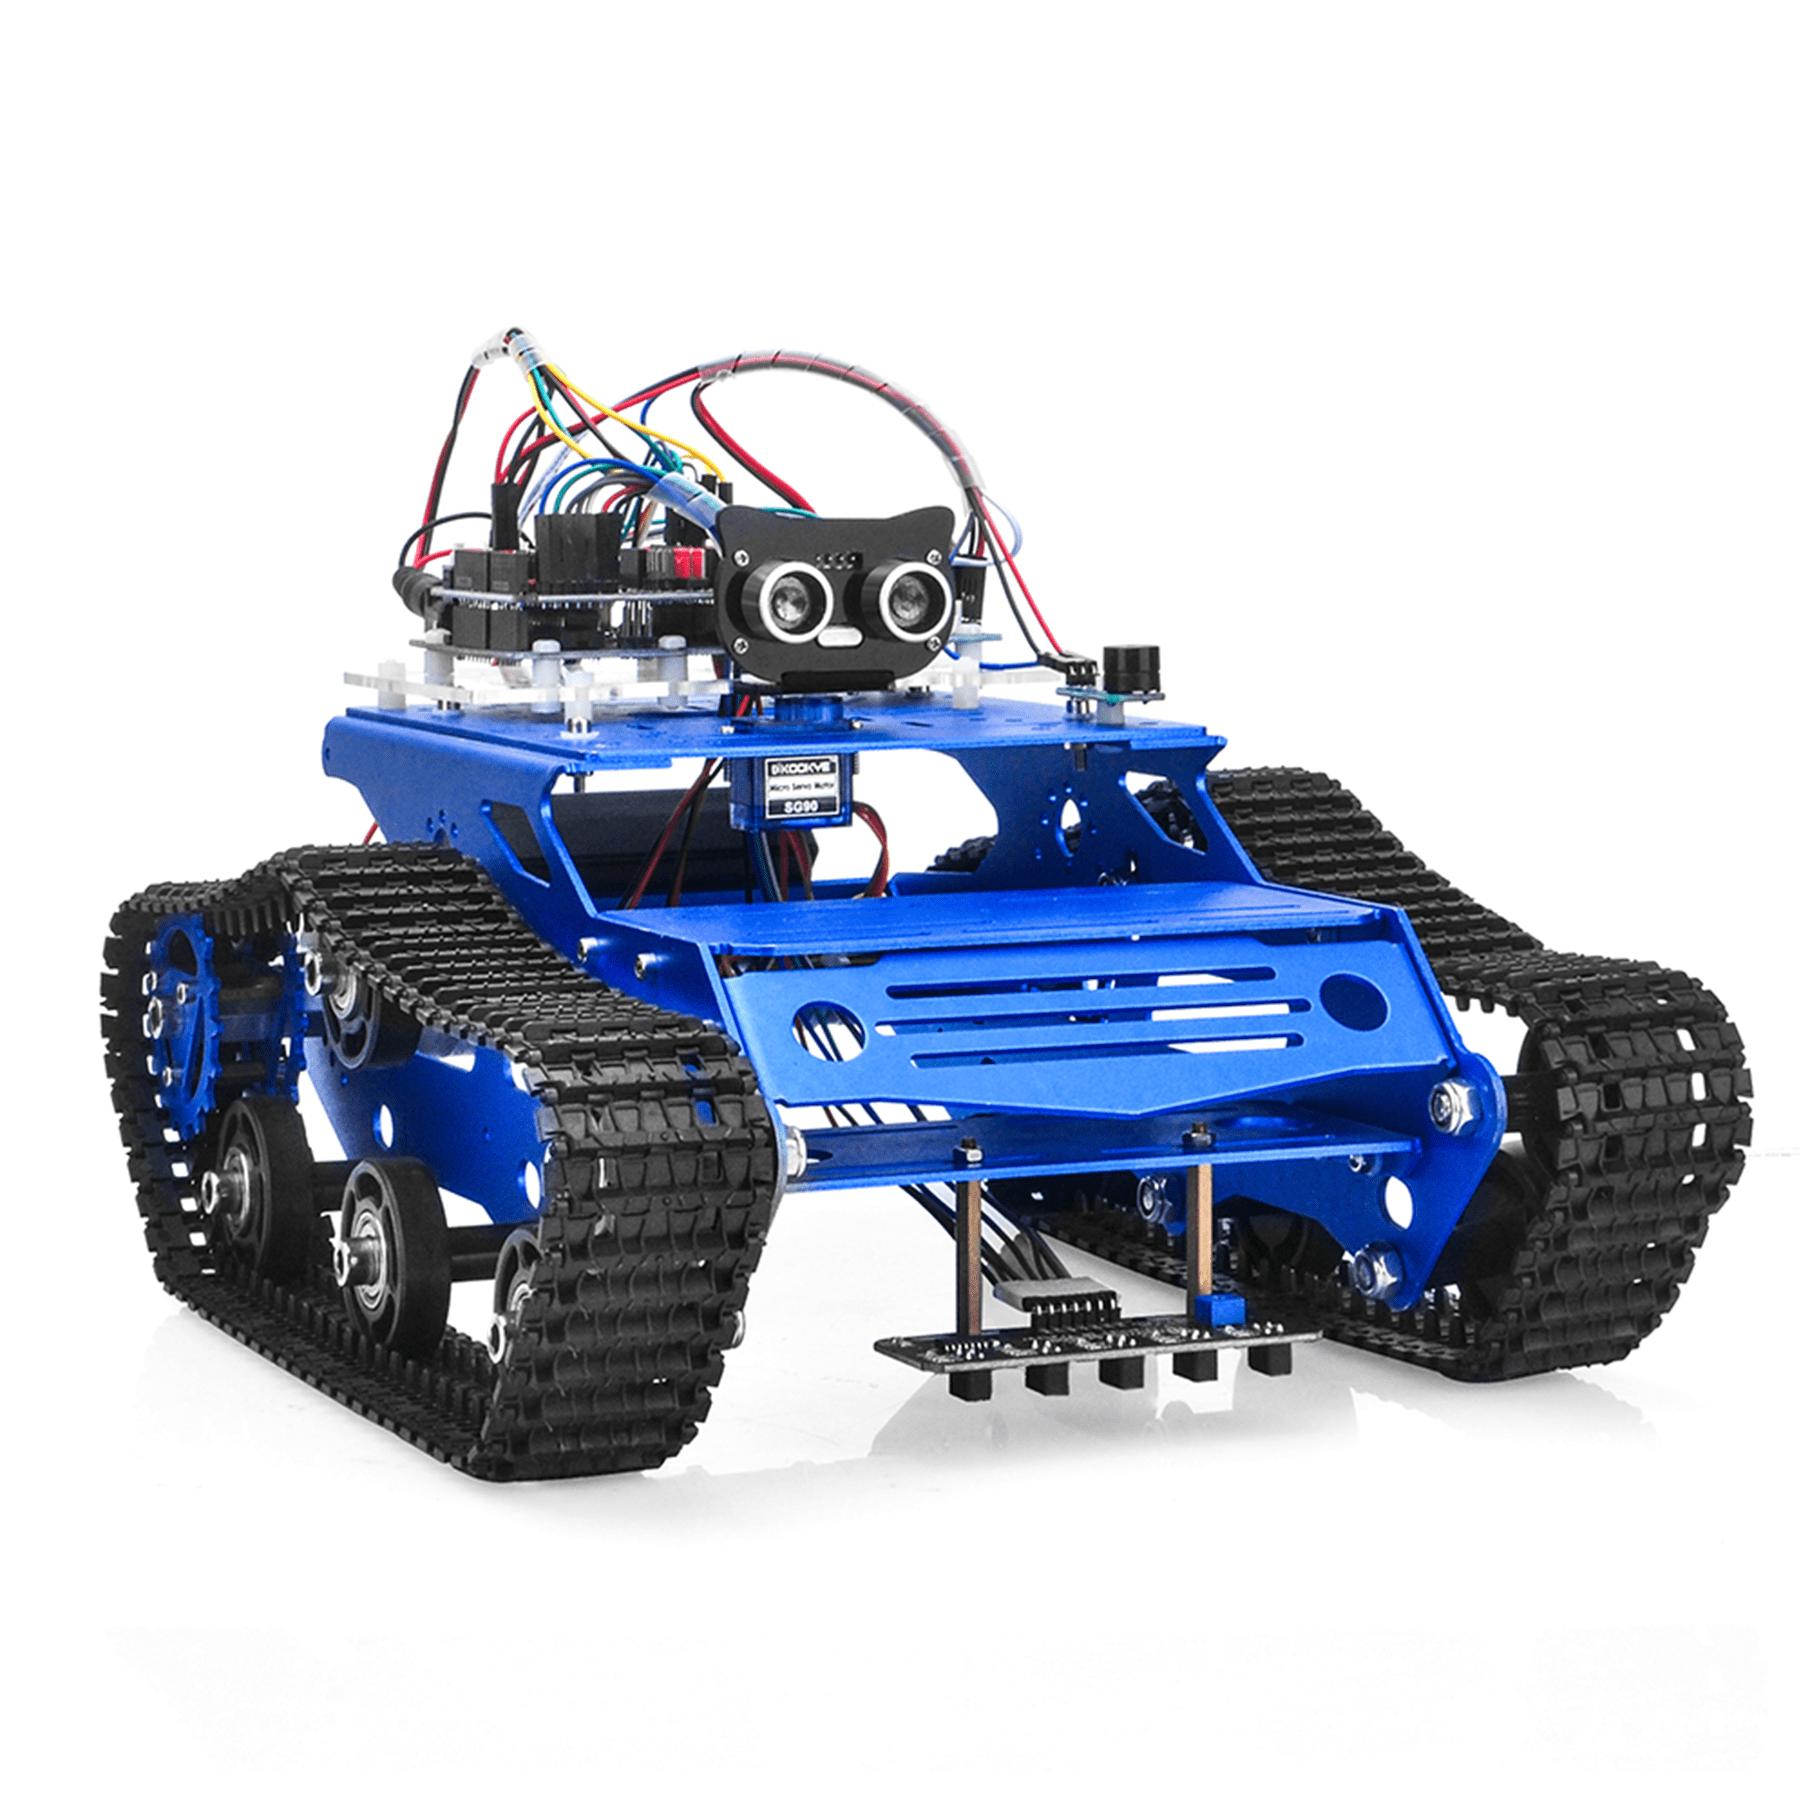 Robot Tank Car Kit V2.0 Lesson8: Use encoder to synchronize motor speed